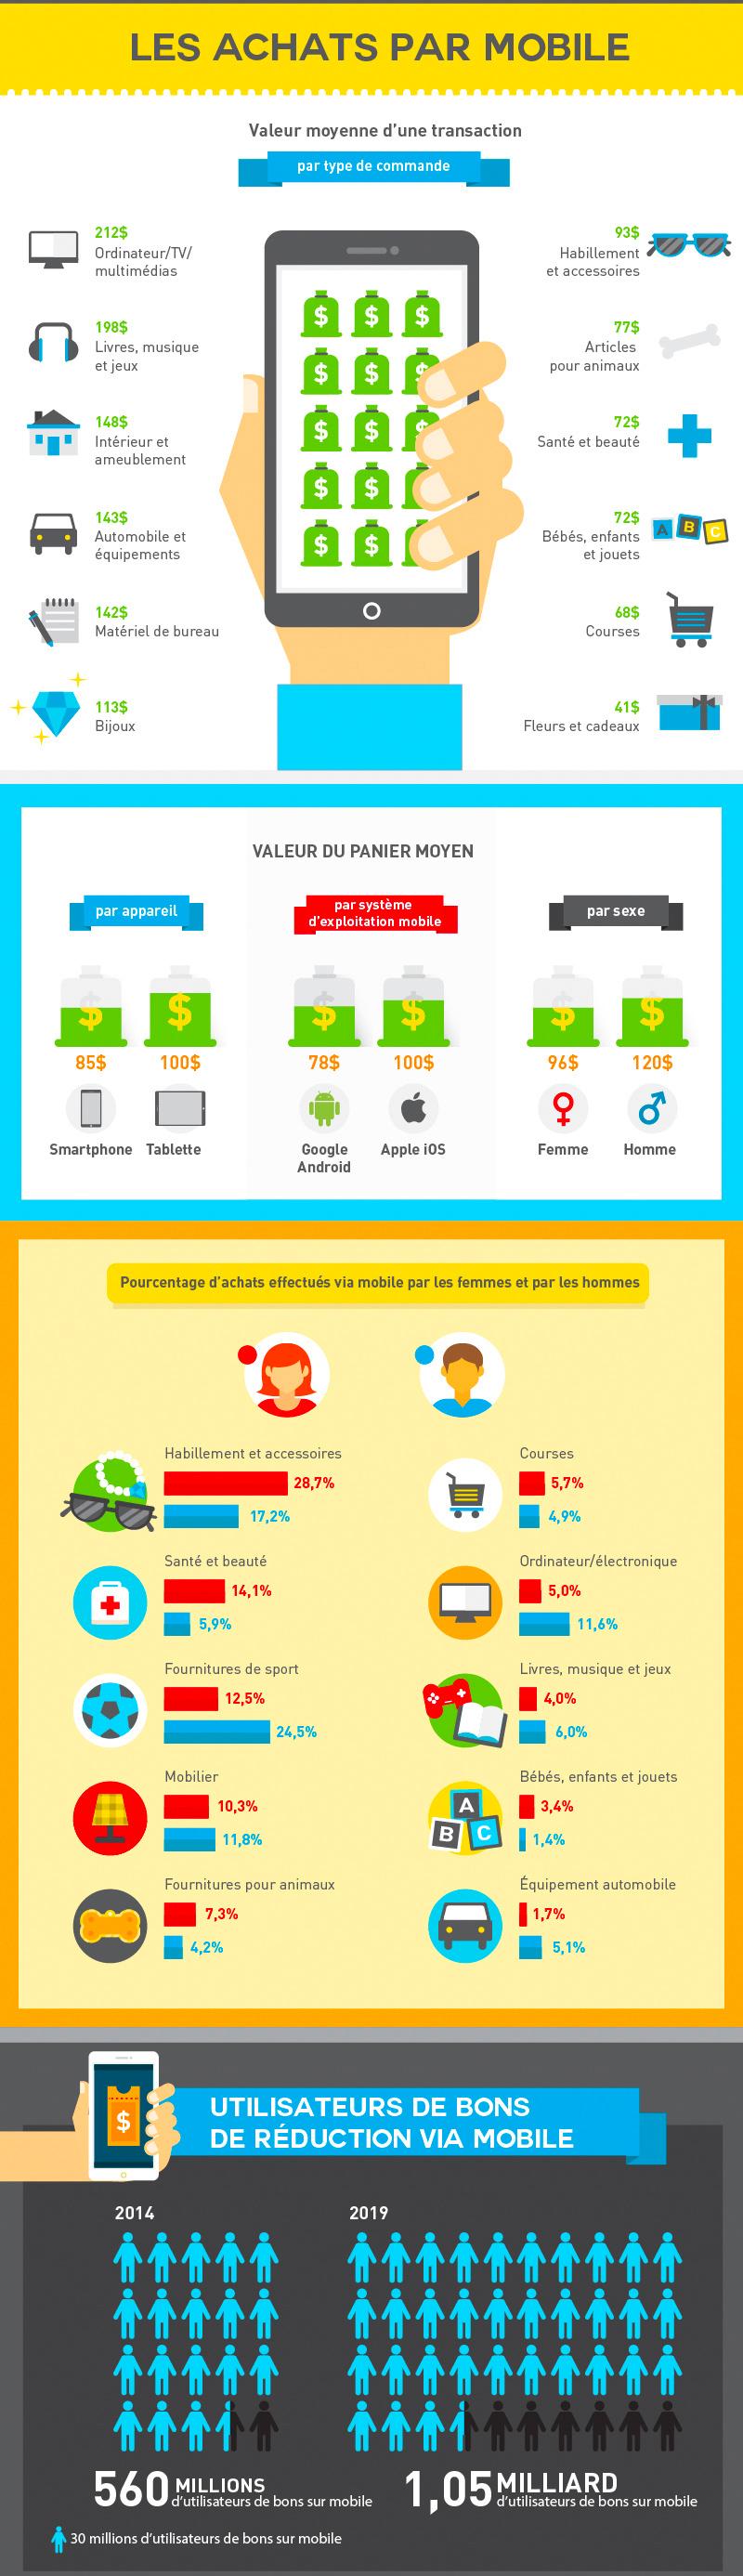 mcommerce-infographie-2